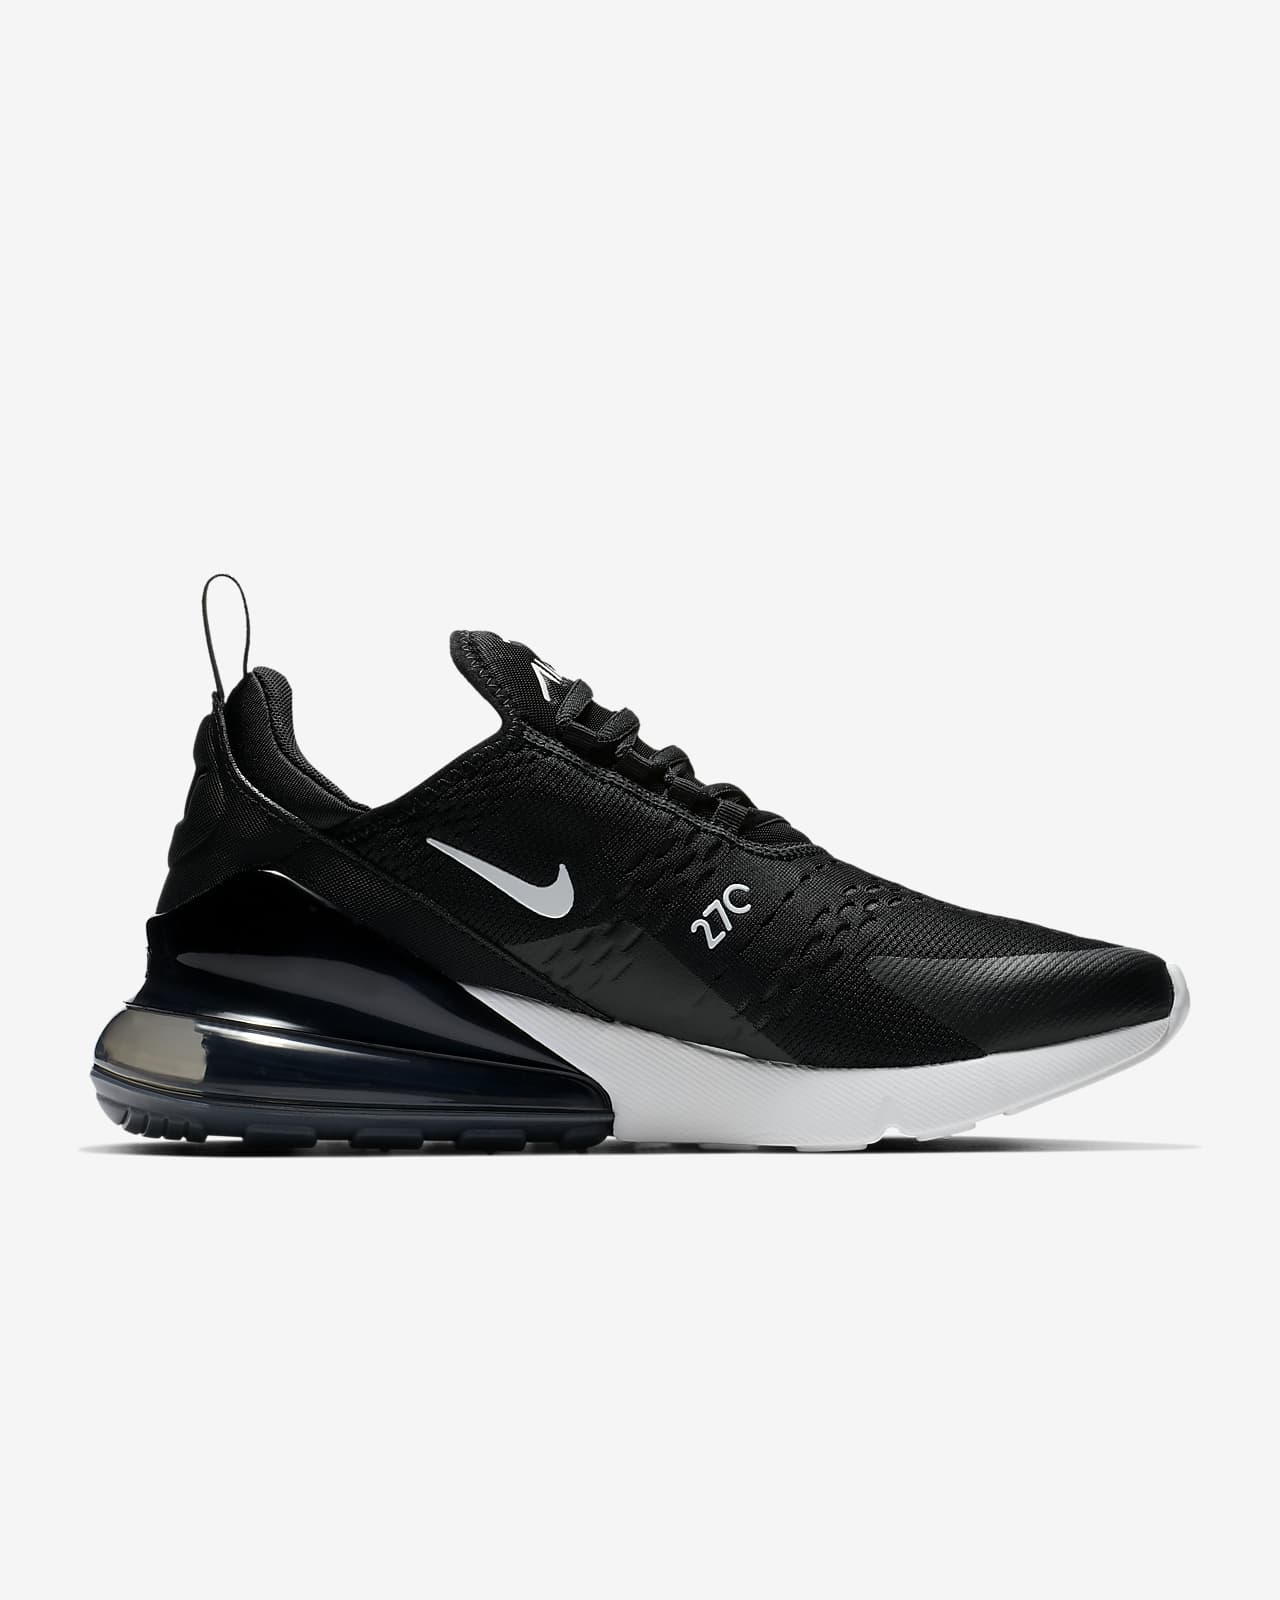 Nike Air Max 270 Women's Shoe. Nike MA